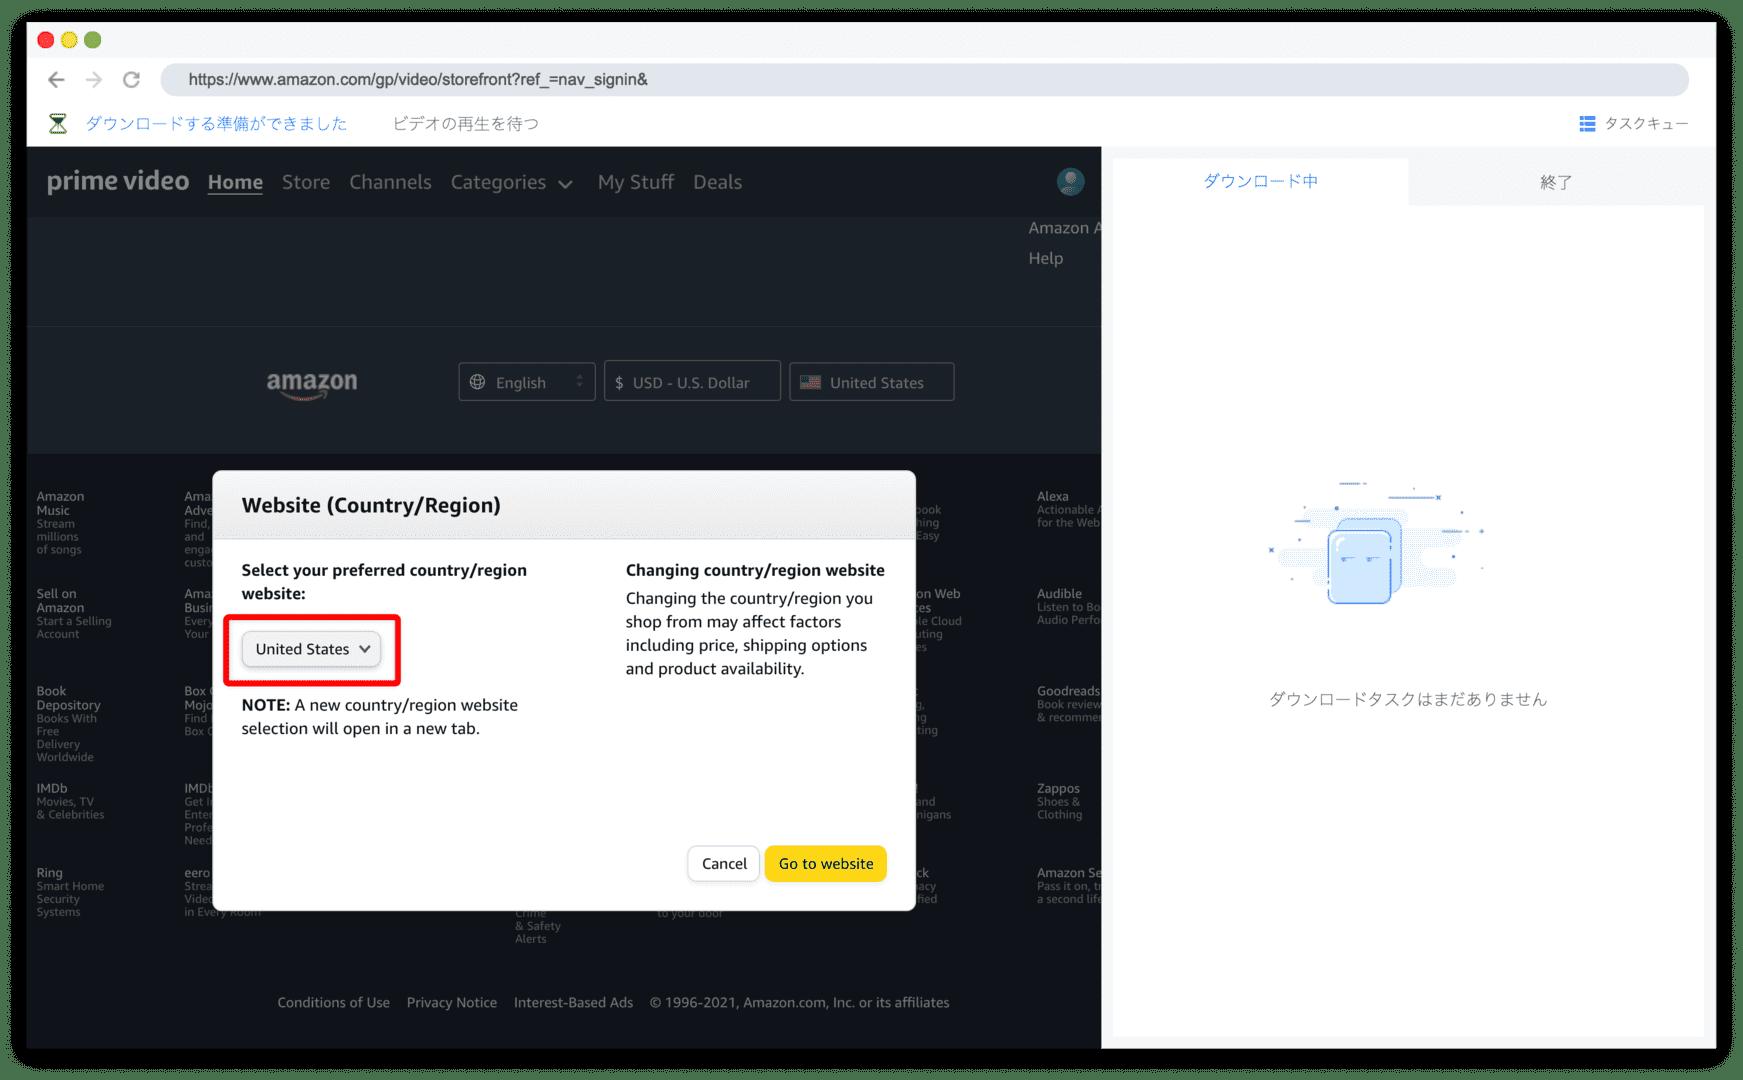 【Mac版アマゾンプライムビデオを録画する】動画をバレずに録画&保存!!Amazonプライムビデオの画面録画方法Mac版 録画した動画はスマホでも再生可能! 録画方法:国・地域の選択画面が表示されたら「United States」と書かれた部分をクリックして「Japan(日本)」を選択します。